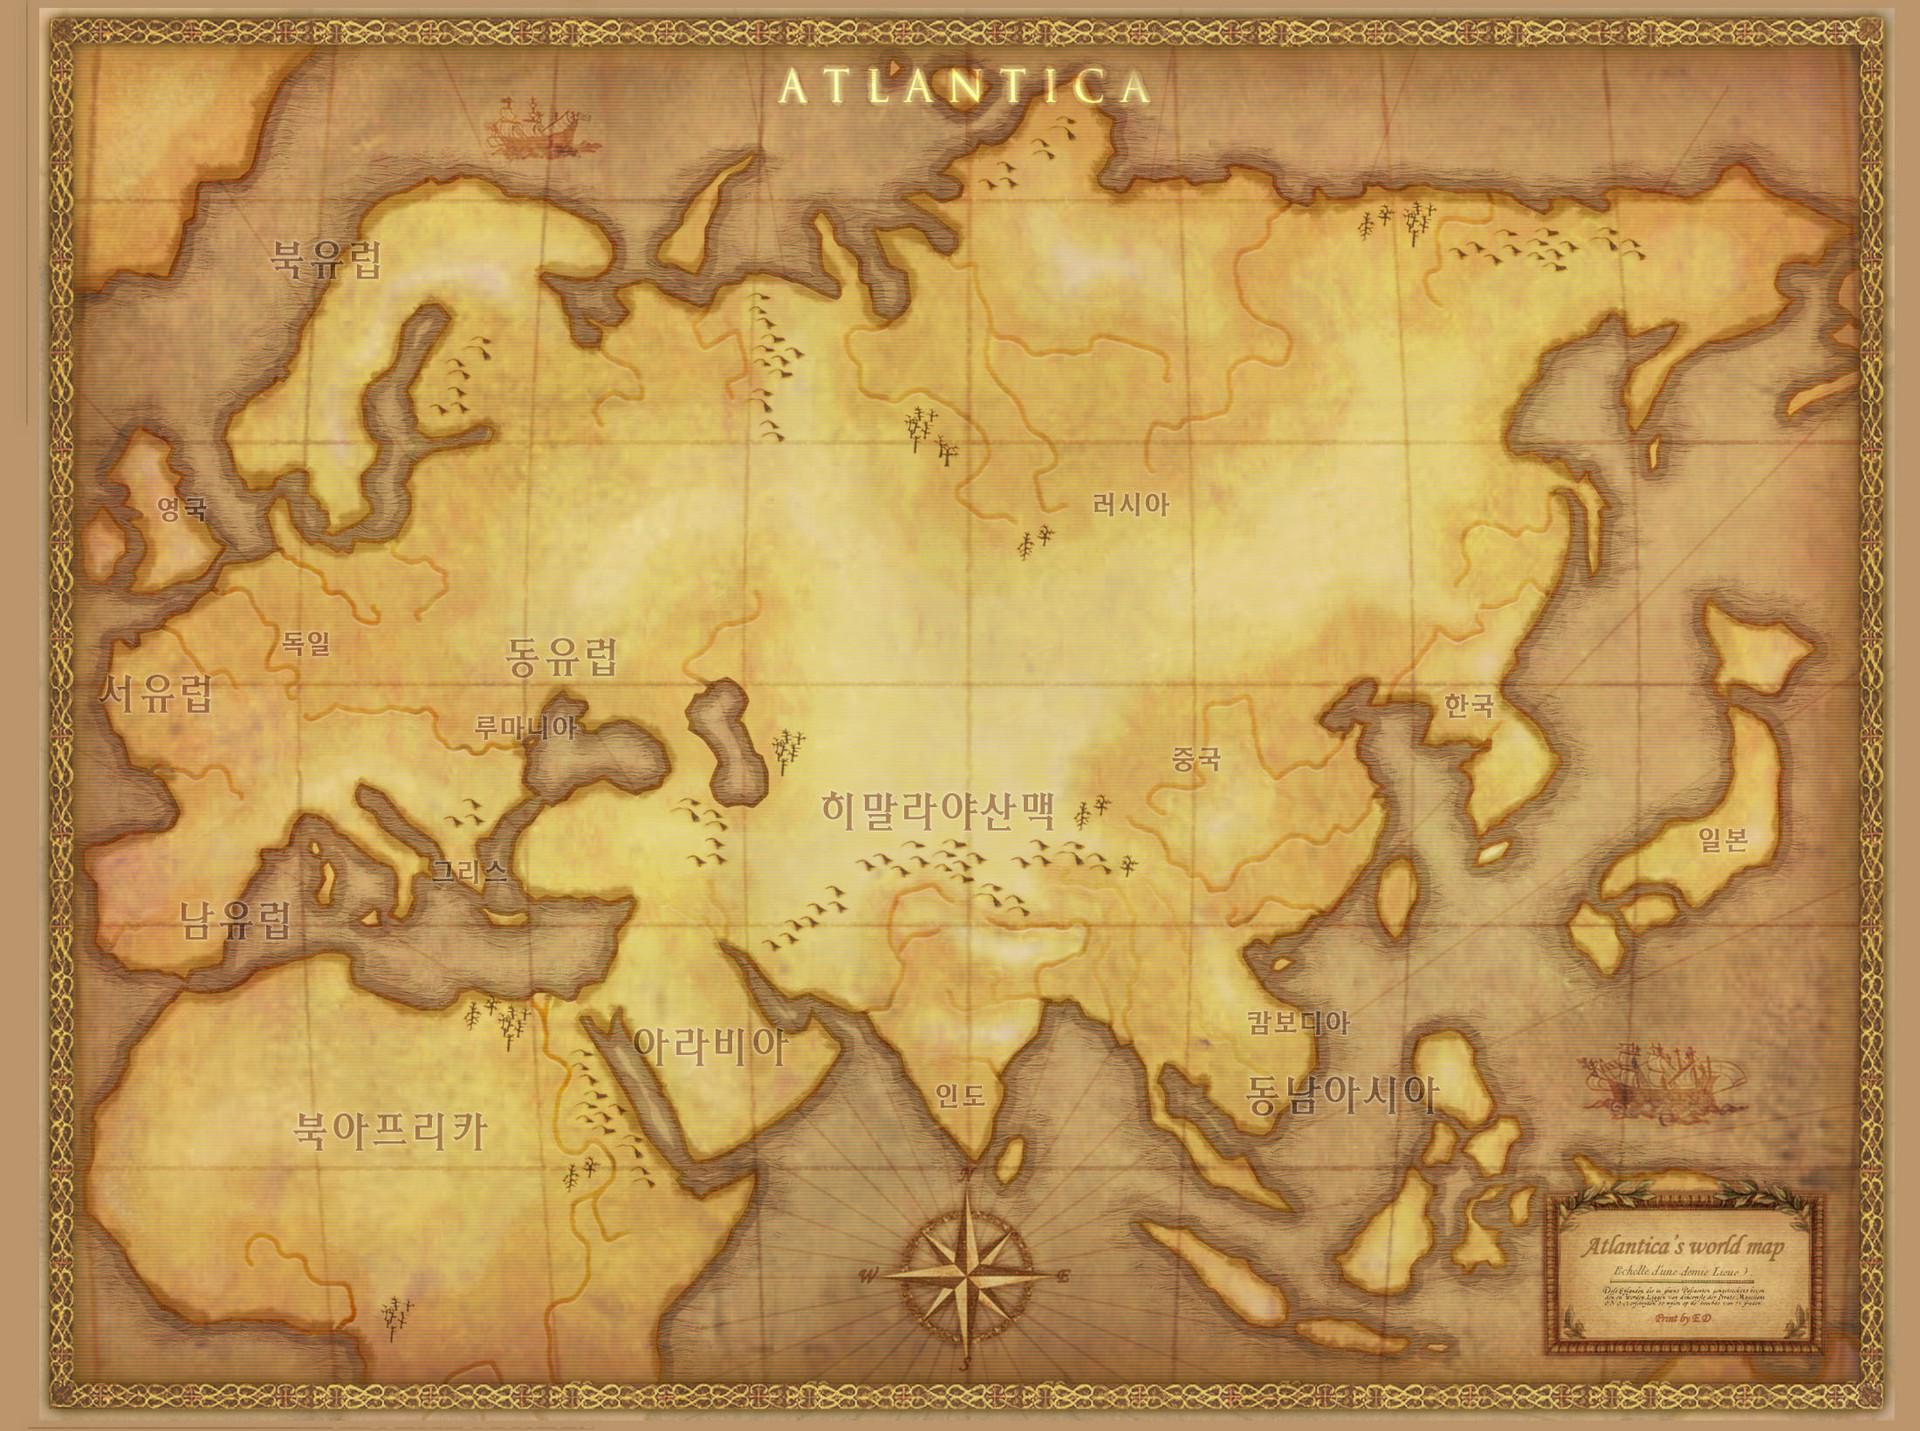 Atlantica World Map Free Download Playapk Co